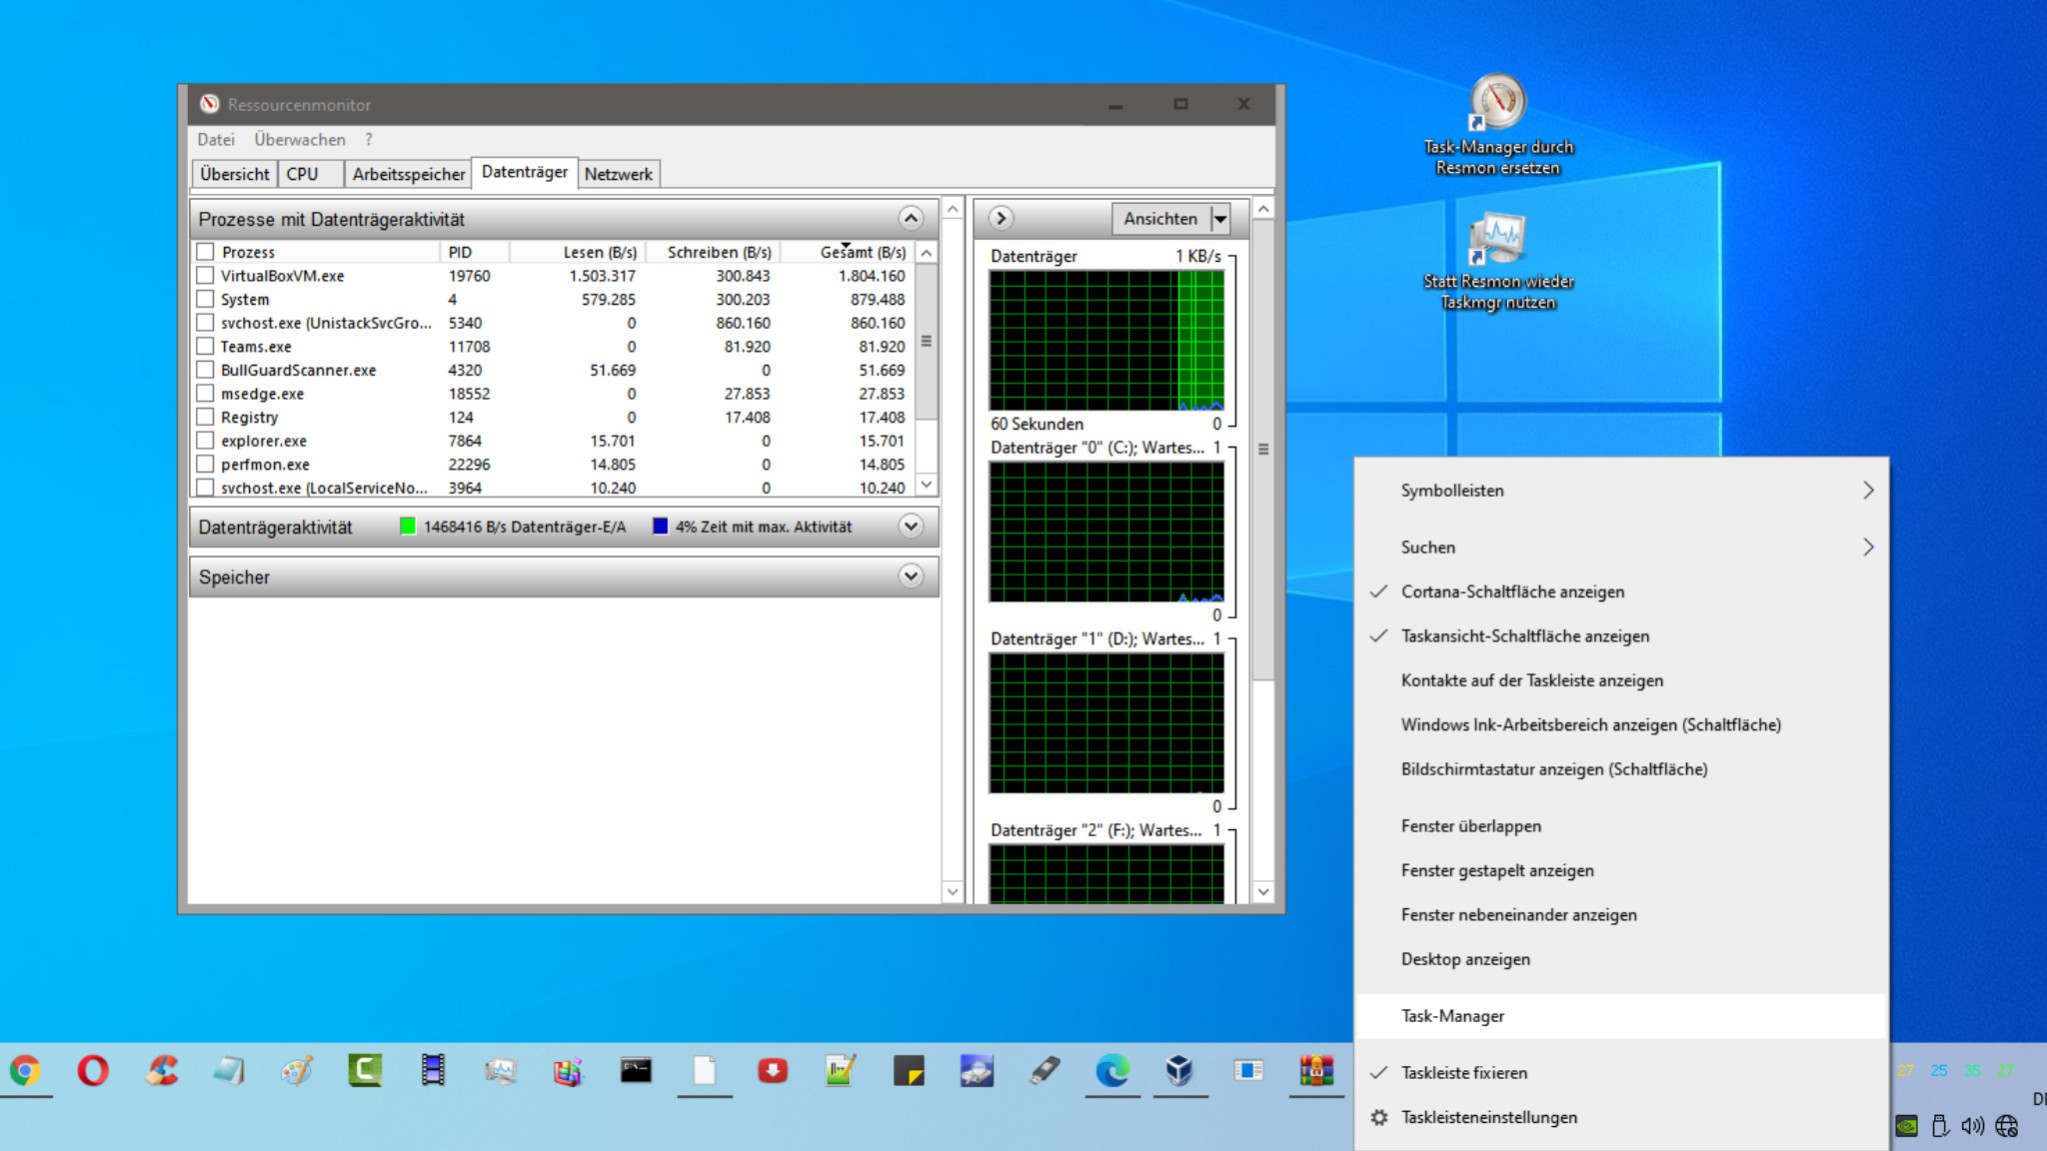 Screenshot 1 - Task-Manager durch Ressourcenmonitor ersetzen